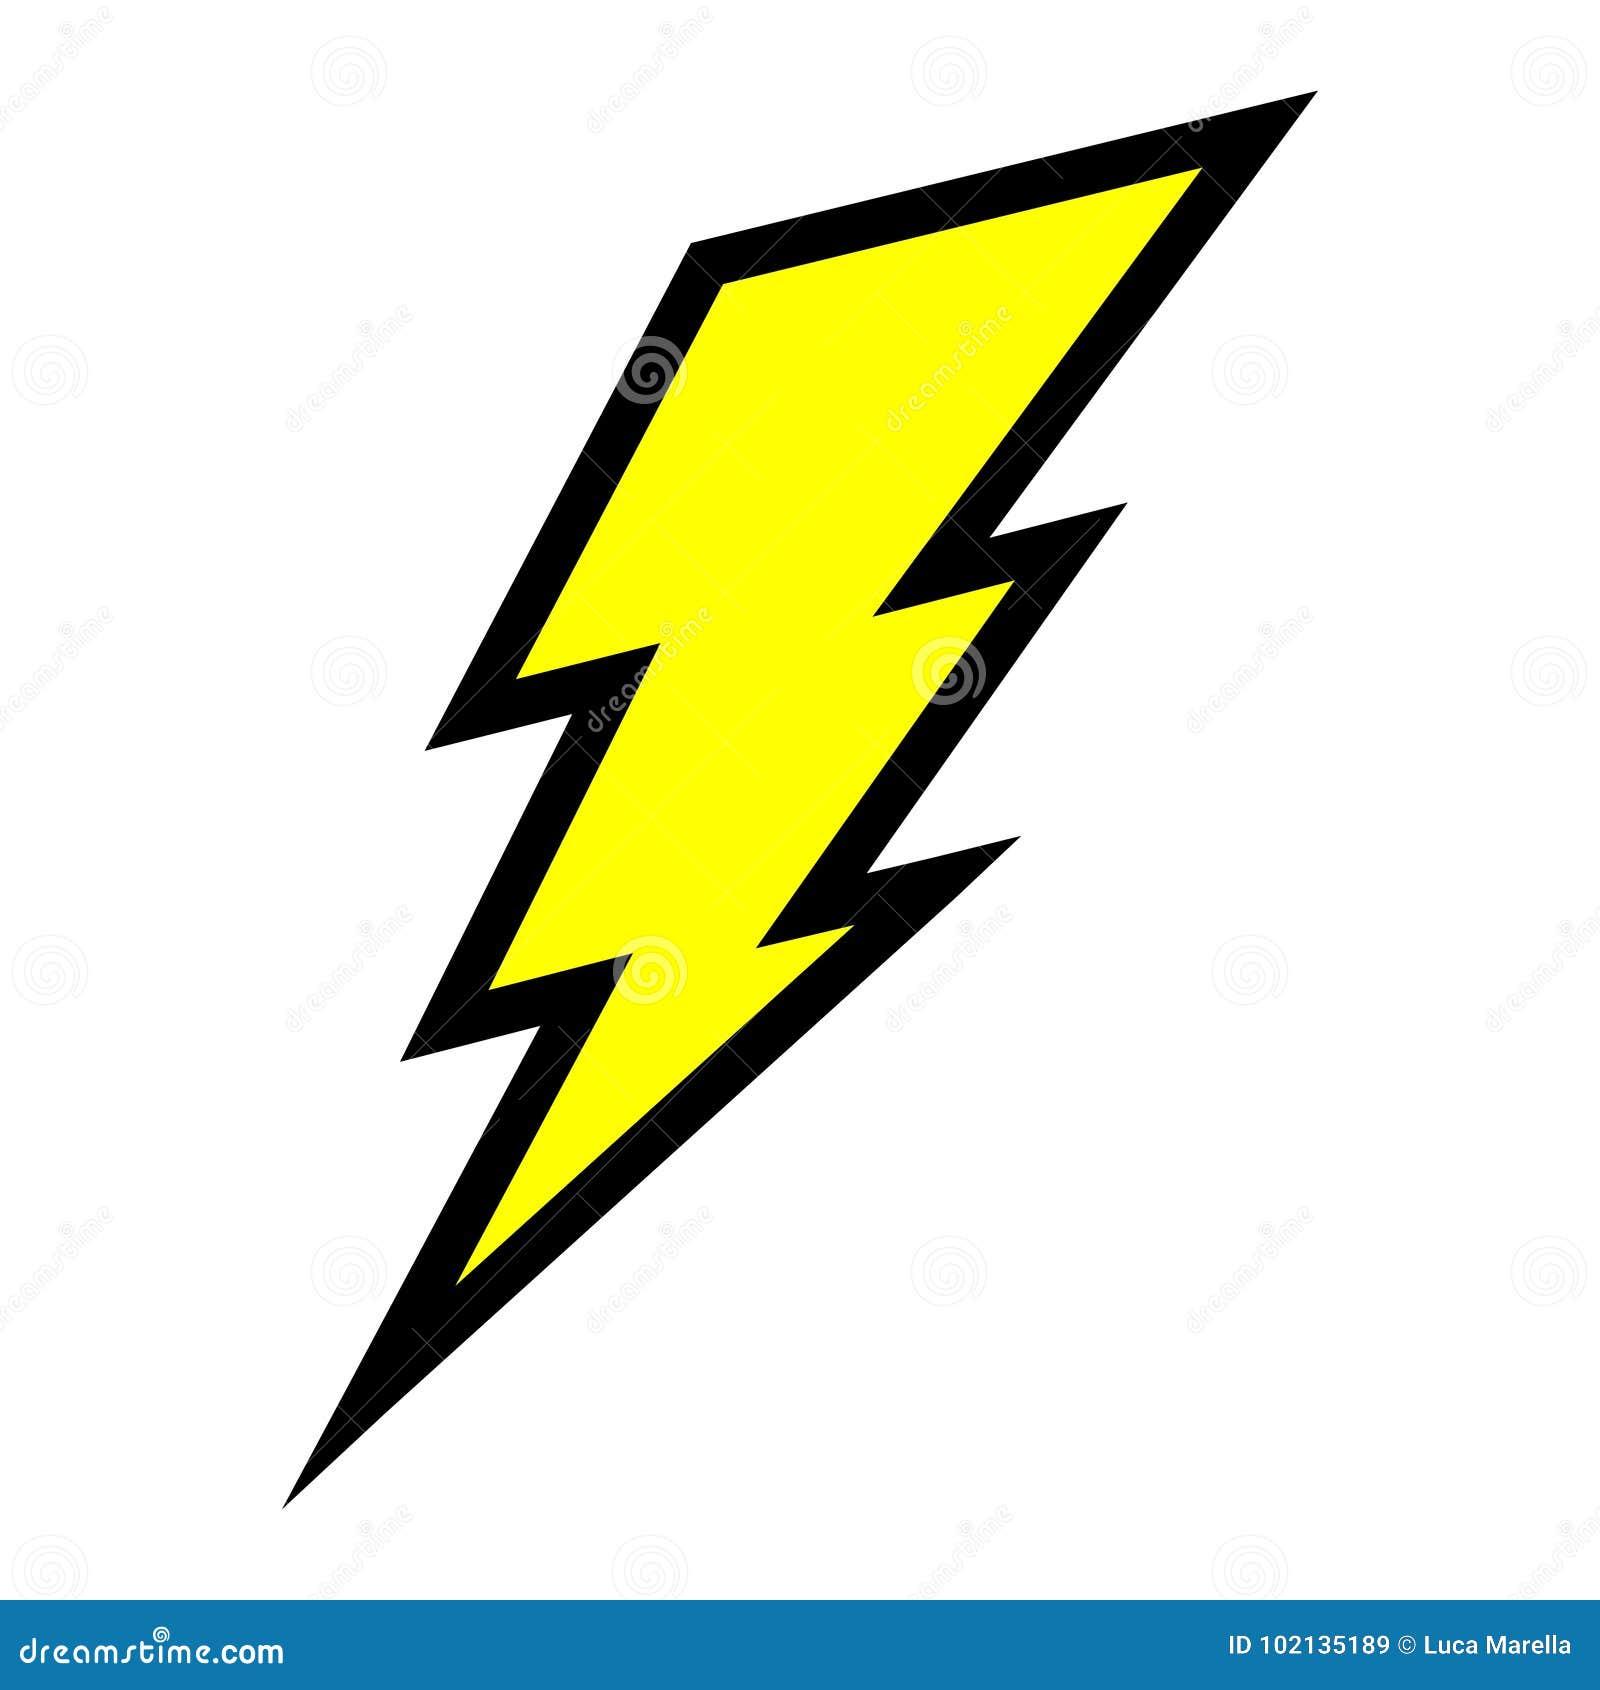 Electric lightning bolt stock vector. Illustration of energetic ...